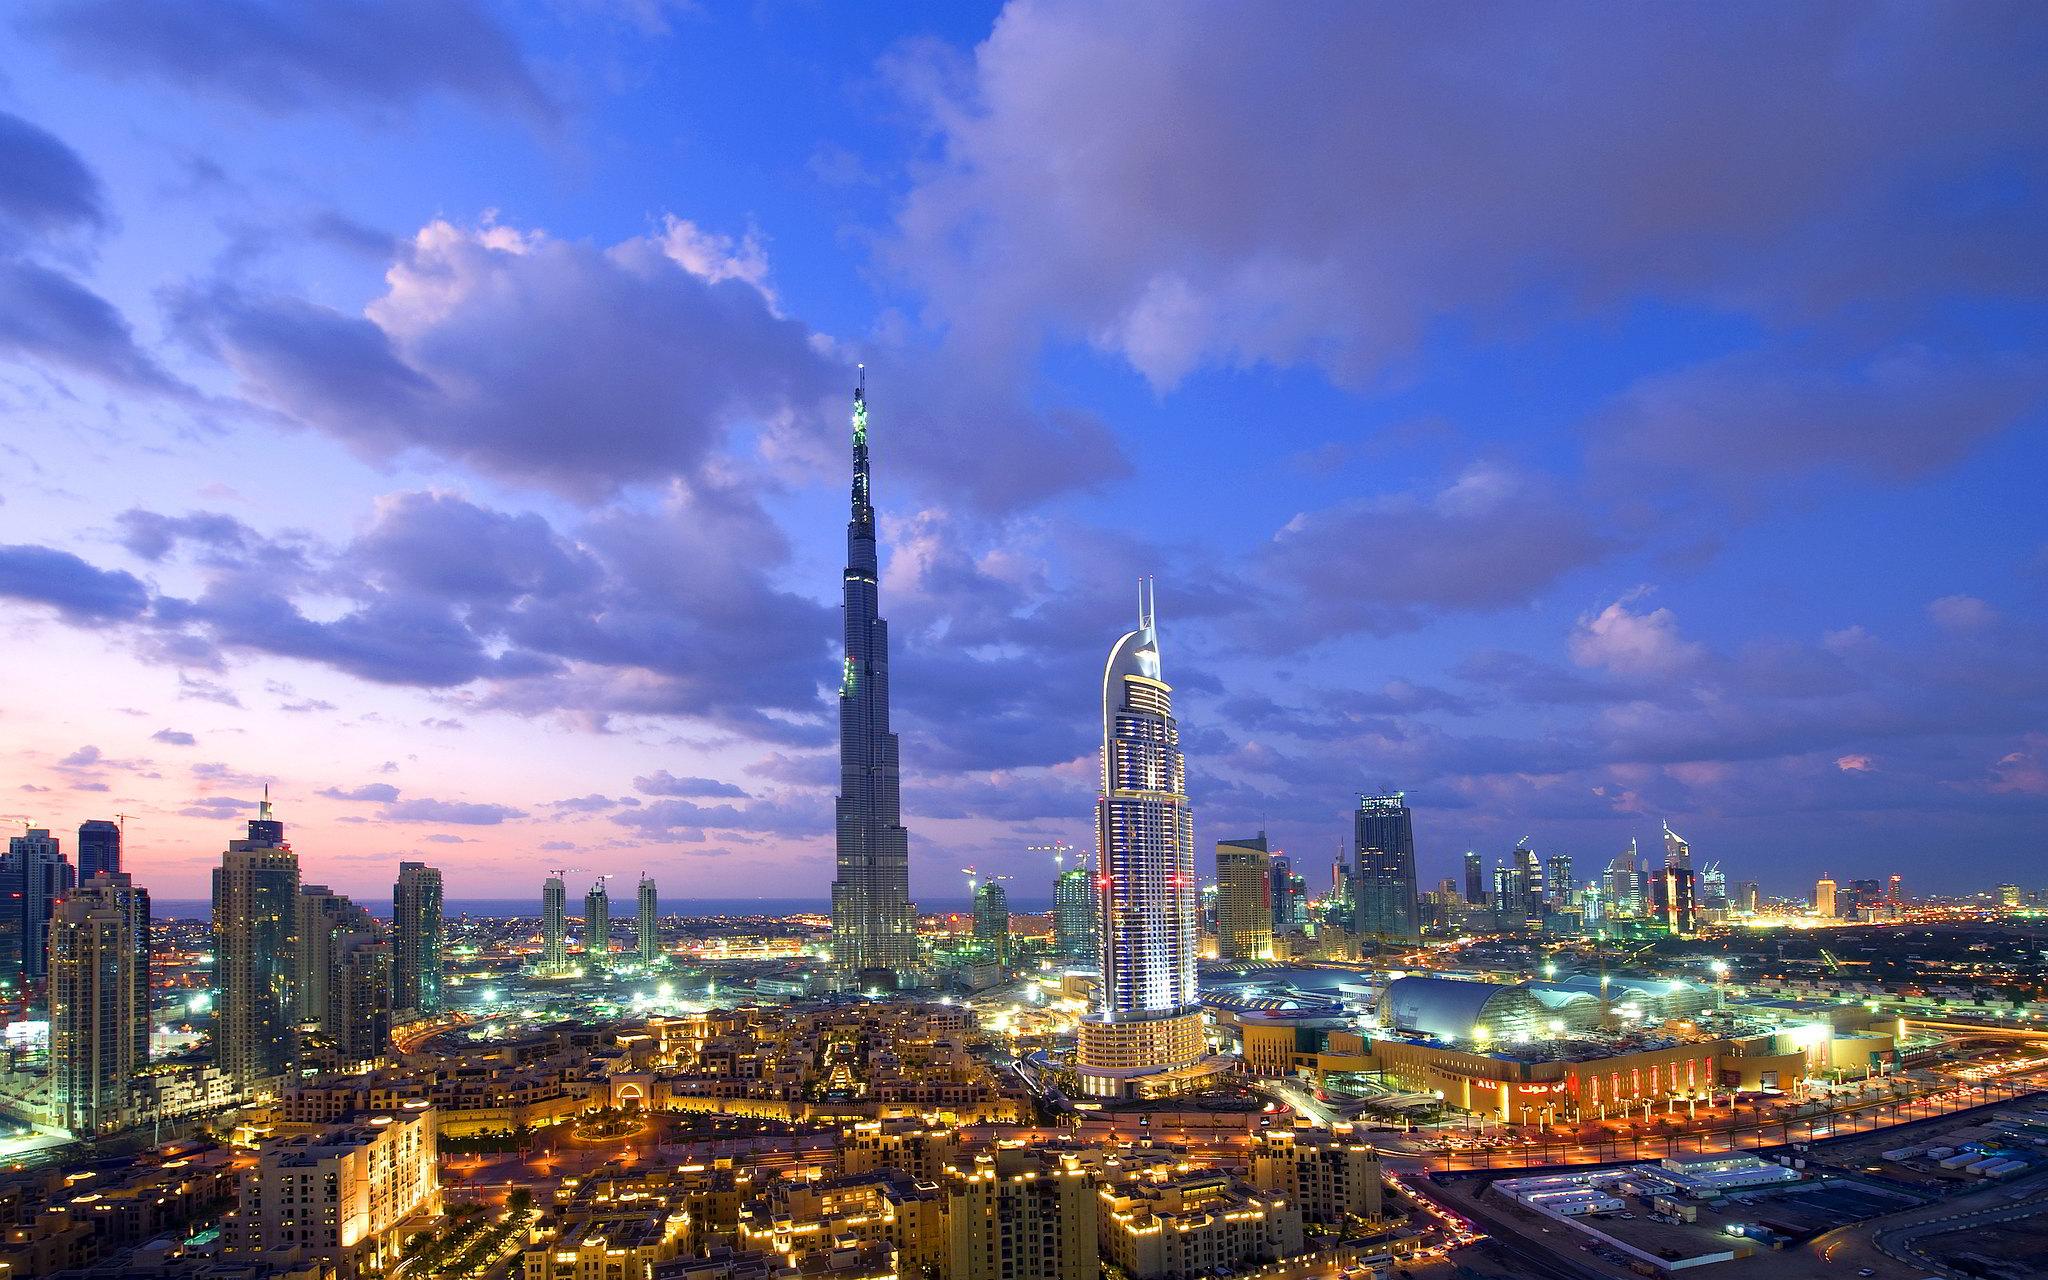 Burj-al-Khalifa-Dubai-hd-wallpaper-download-free-photo